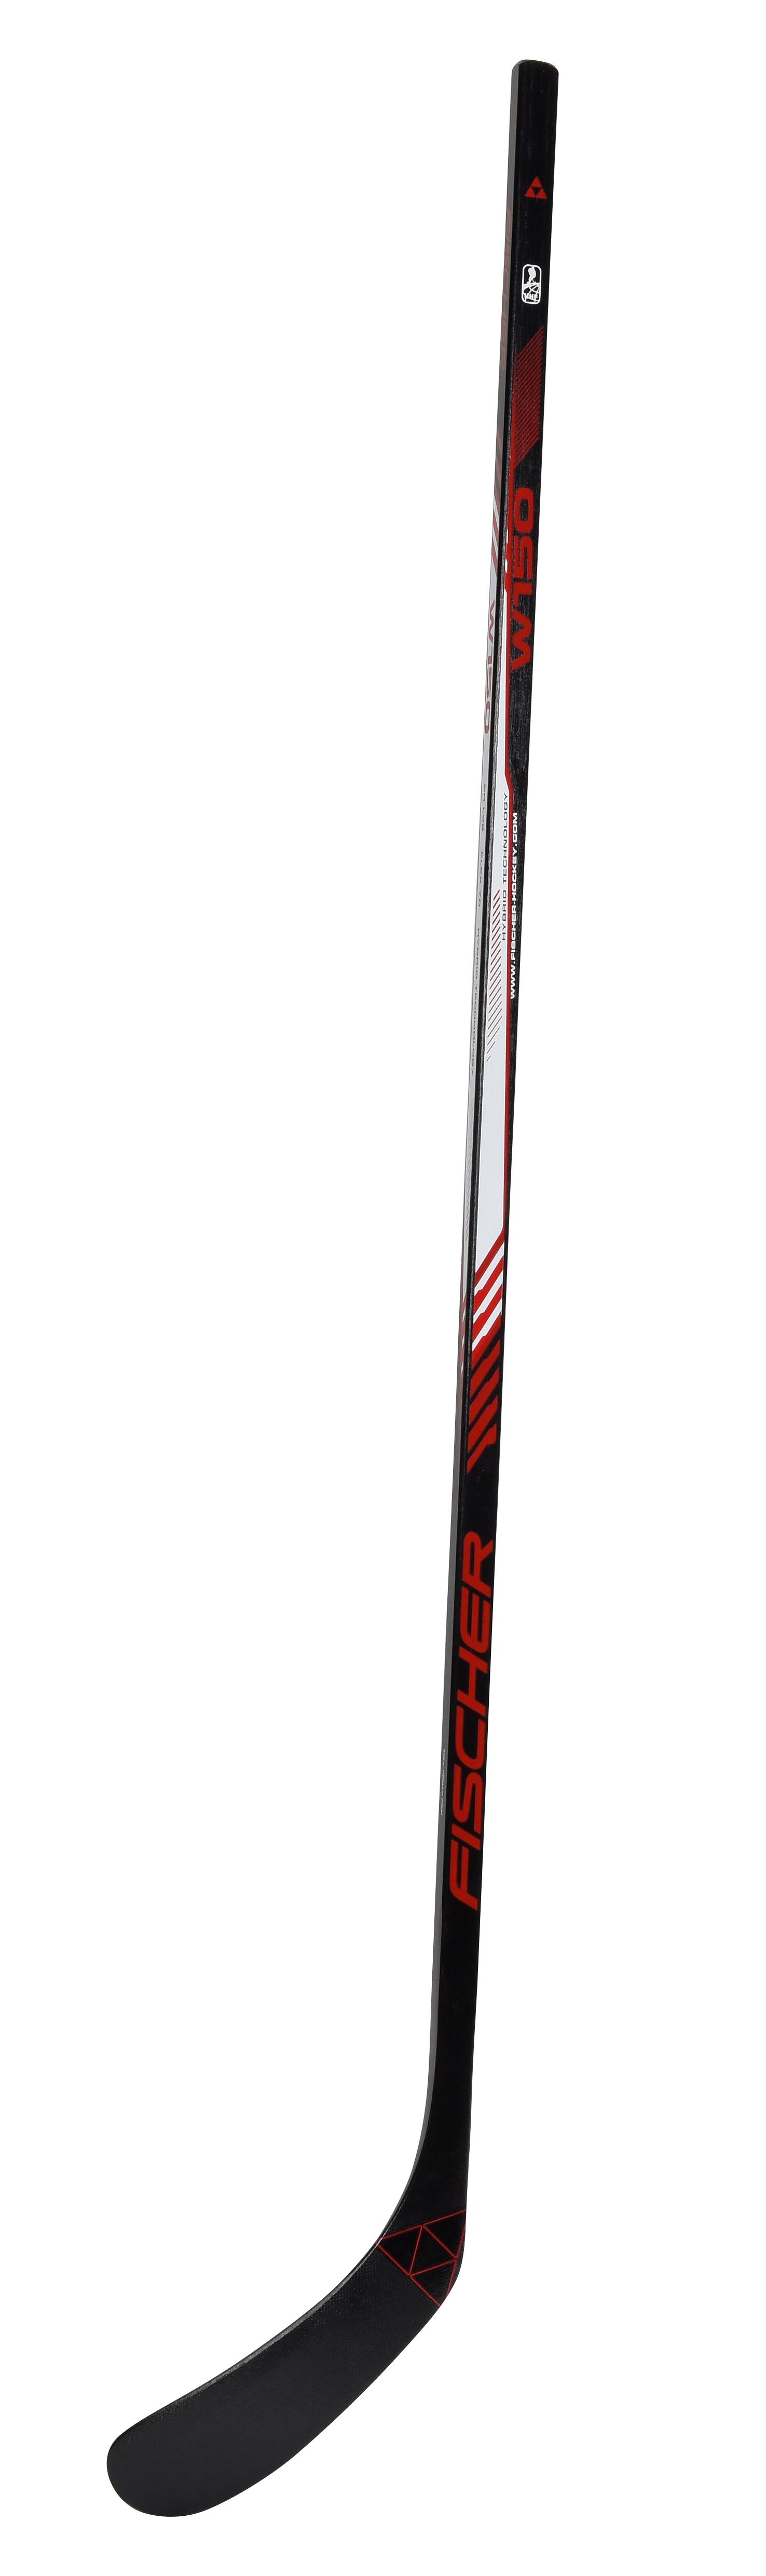 Hokejka FISCHER W150 YTH